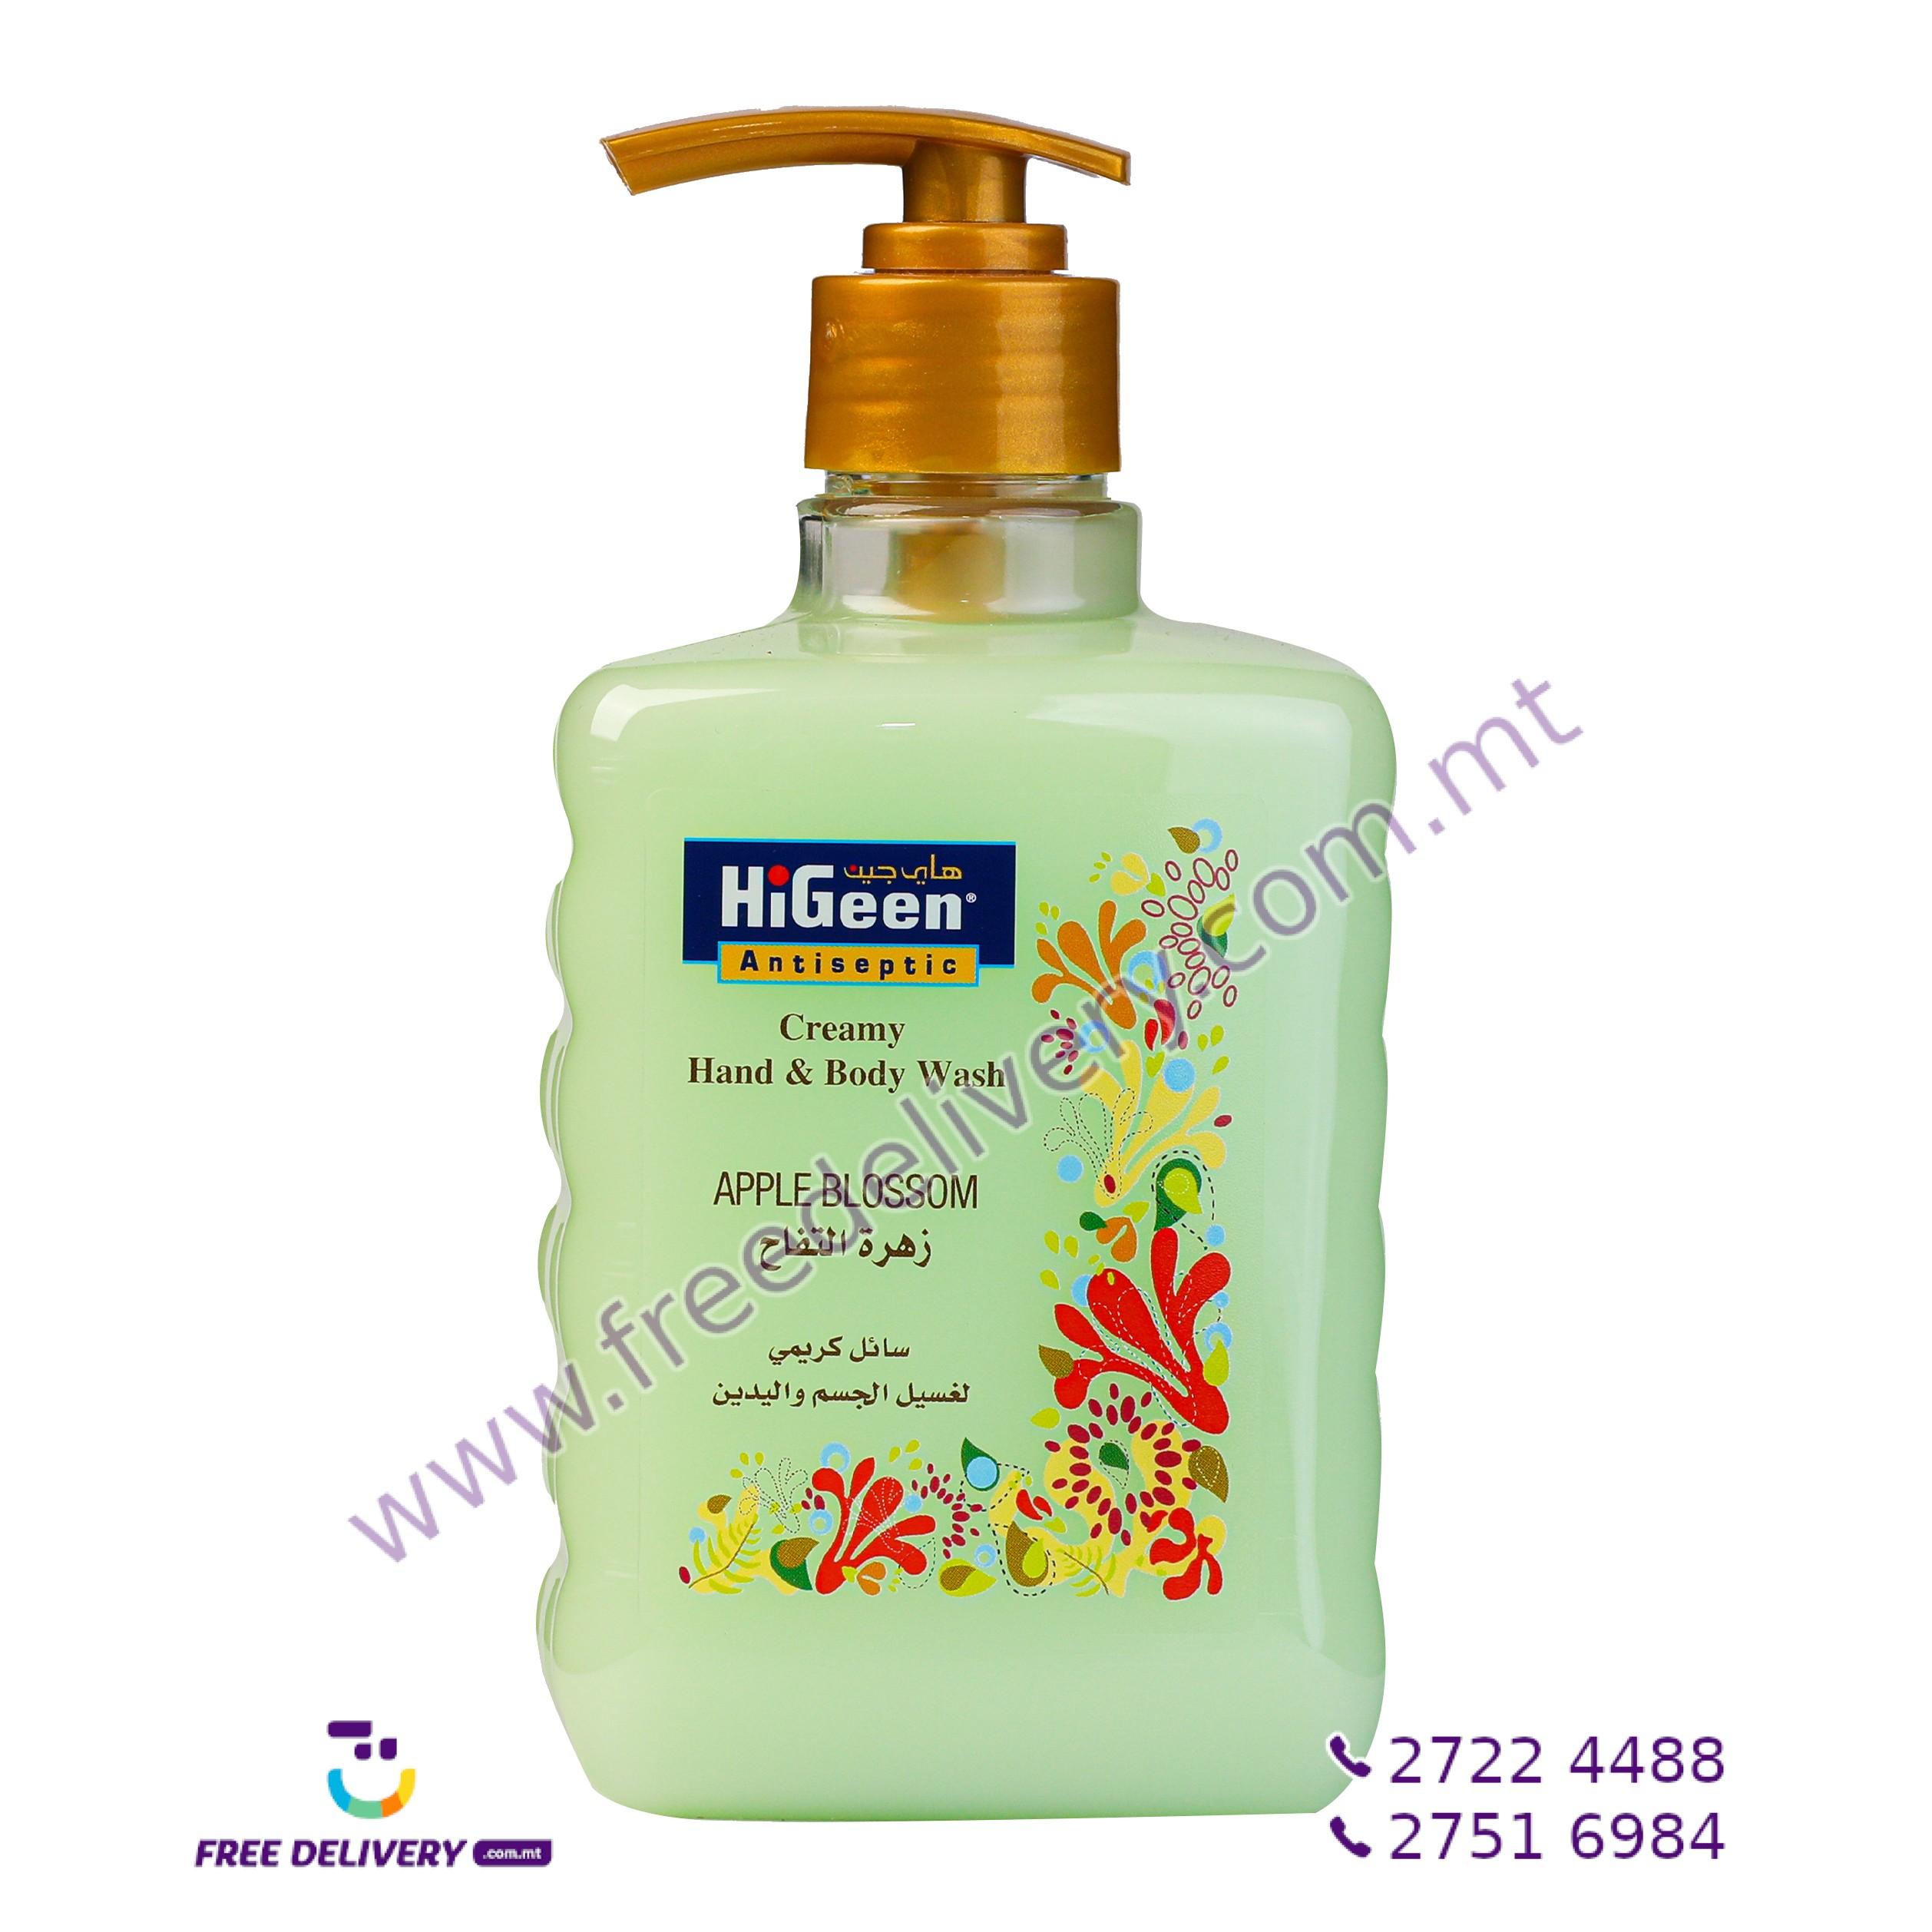 HIGEEN CREAMY HAND & BODY WASH APPLE BLOSSOM 500ML HI003165